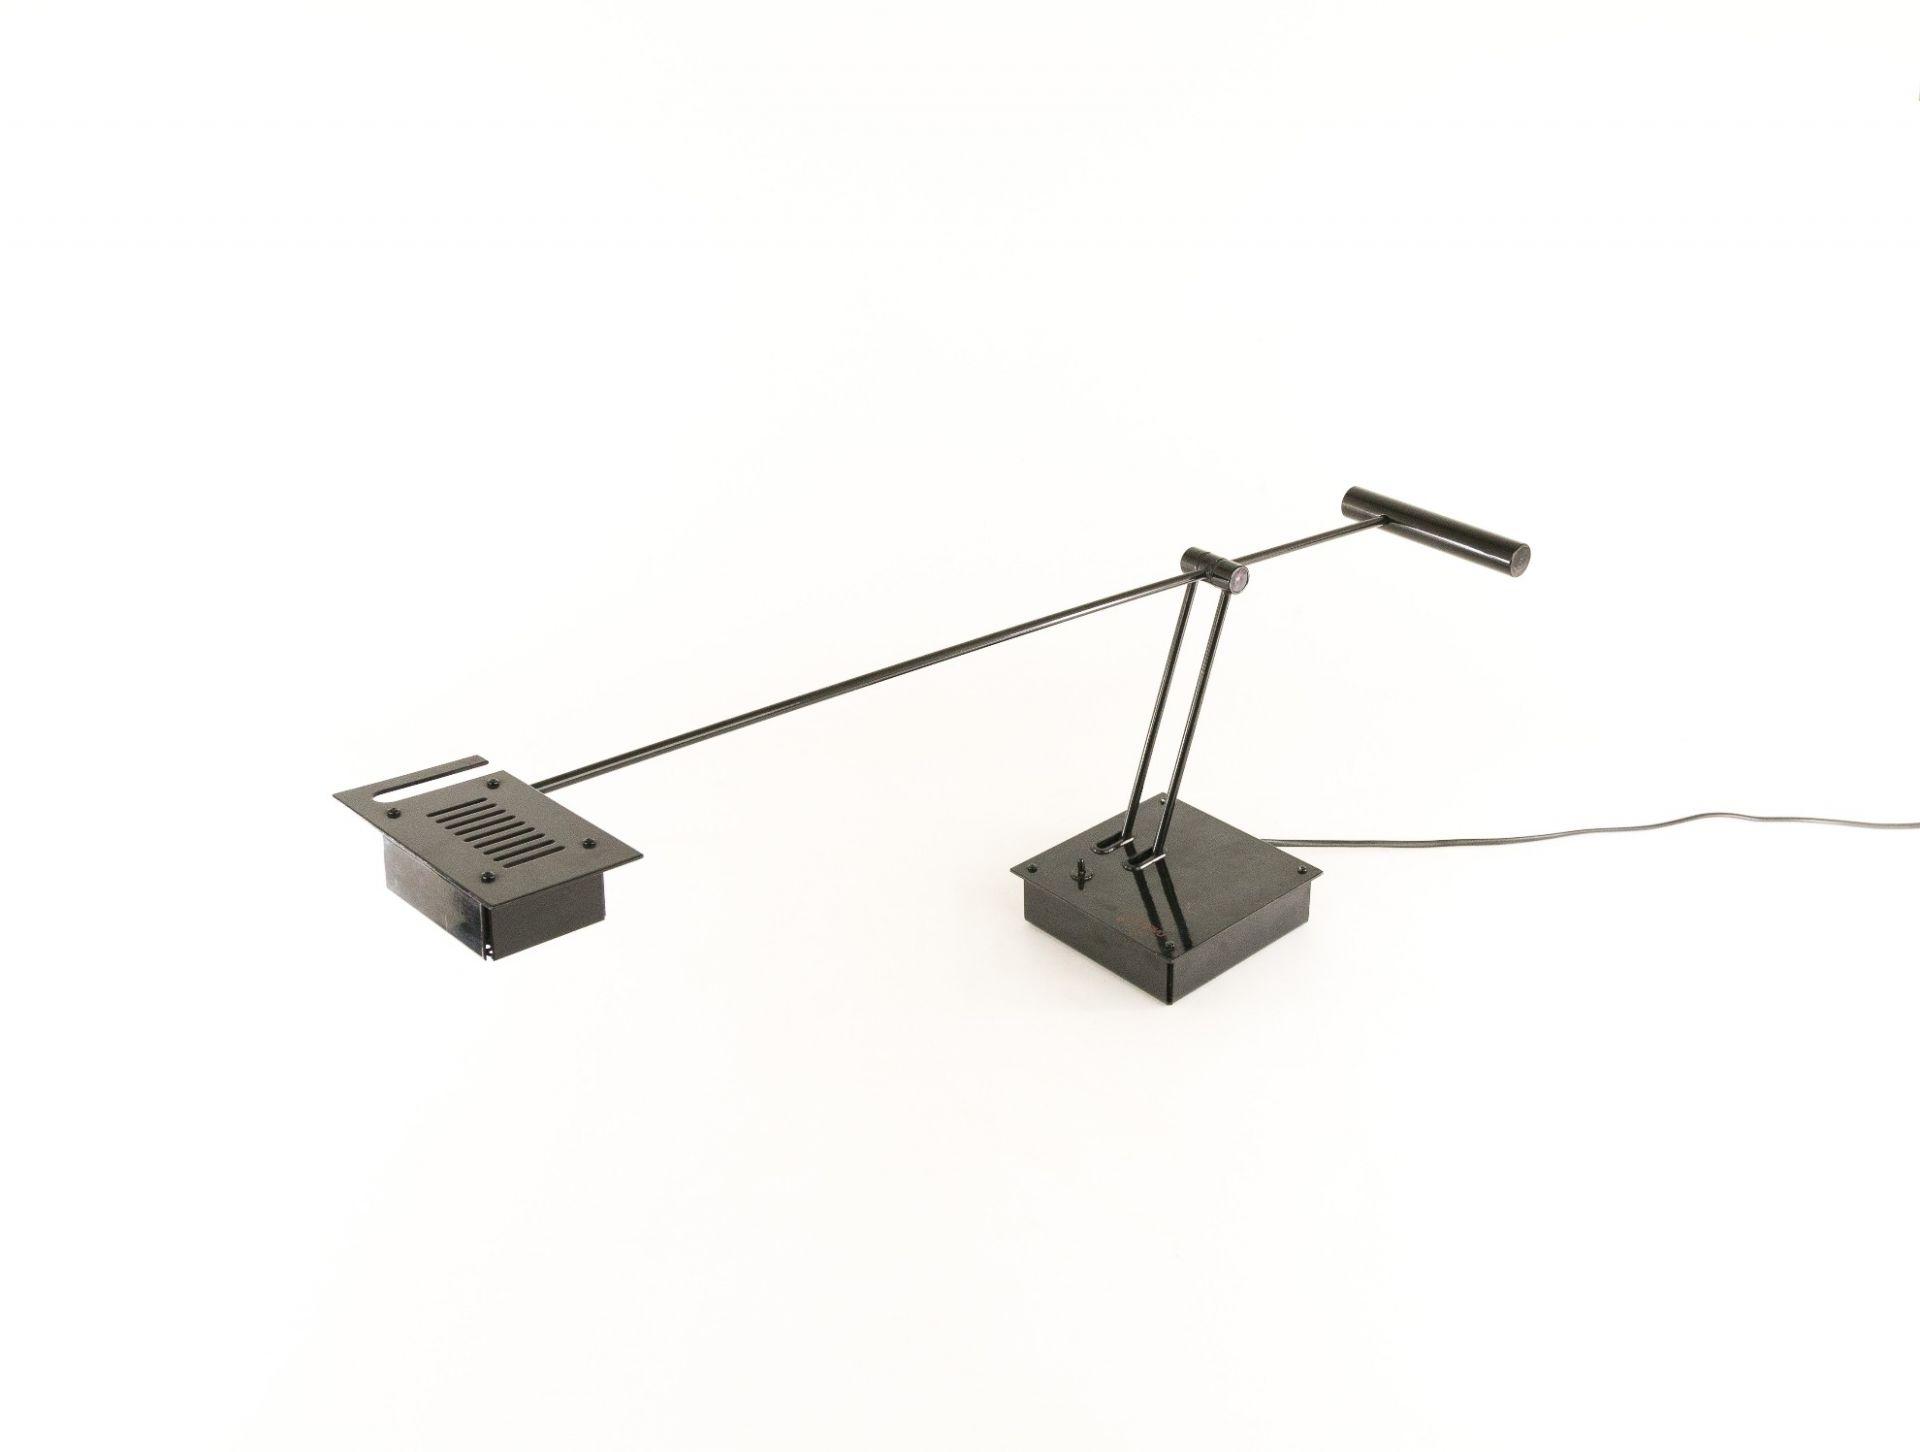 Sigheaki Asahara table lamp Samurai for Stilnovo in black, 1970s